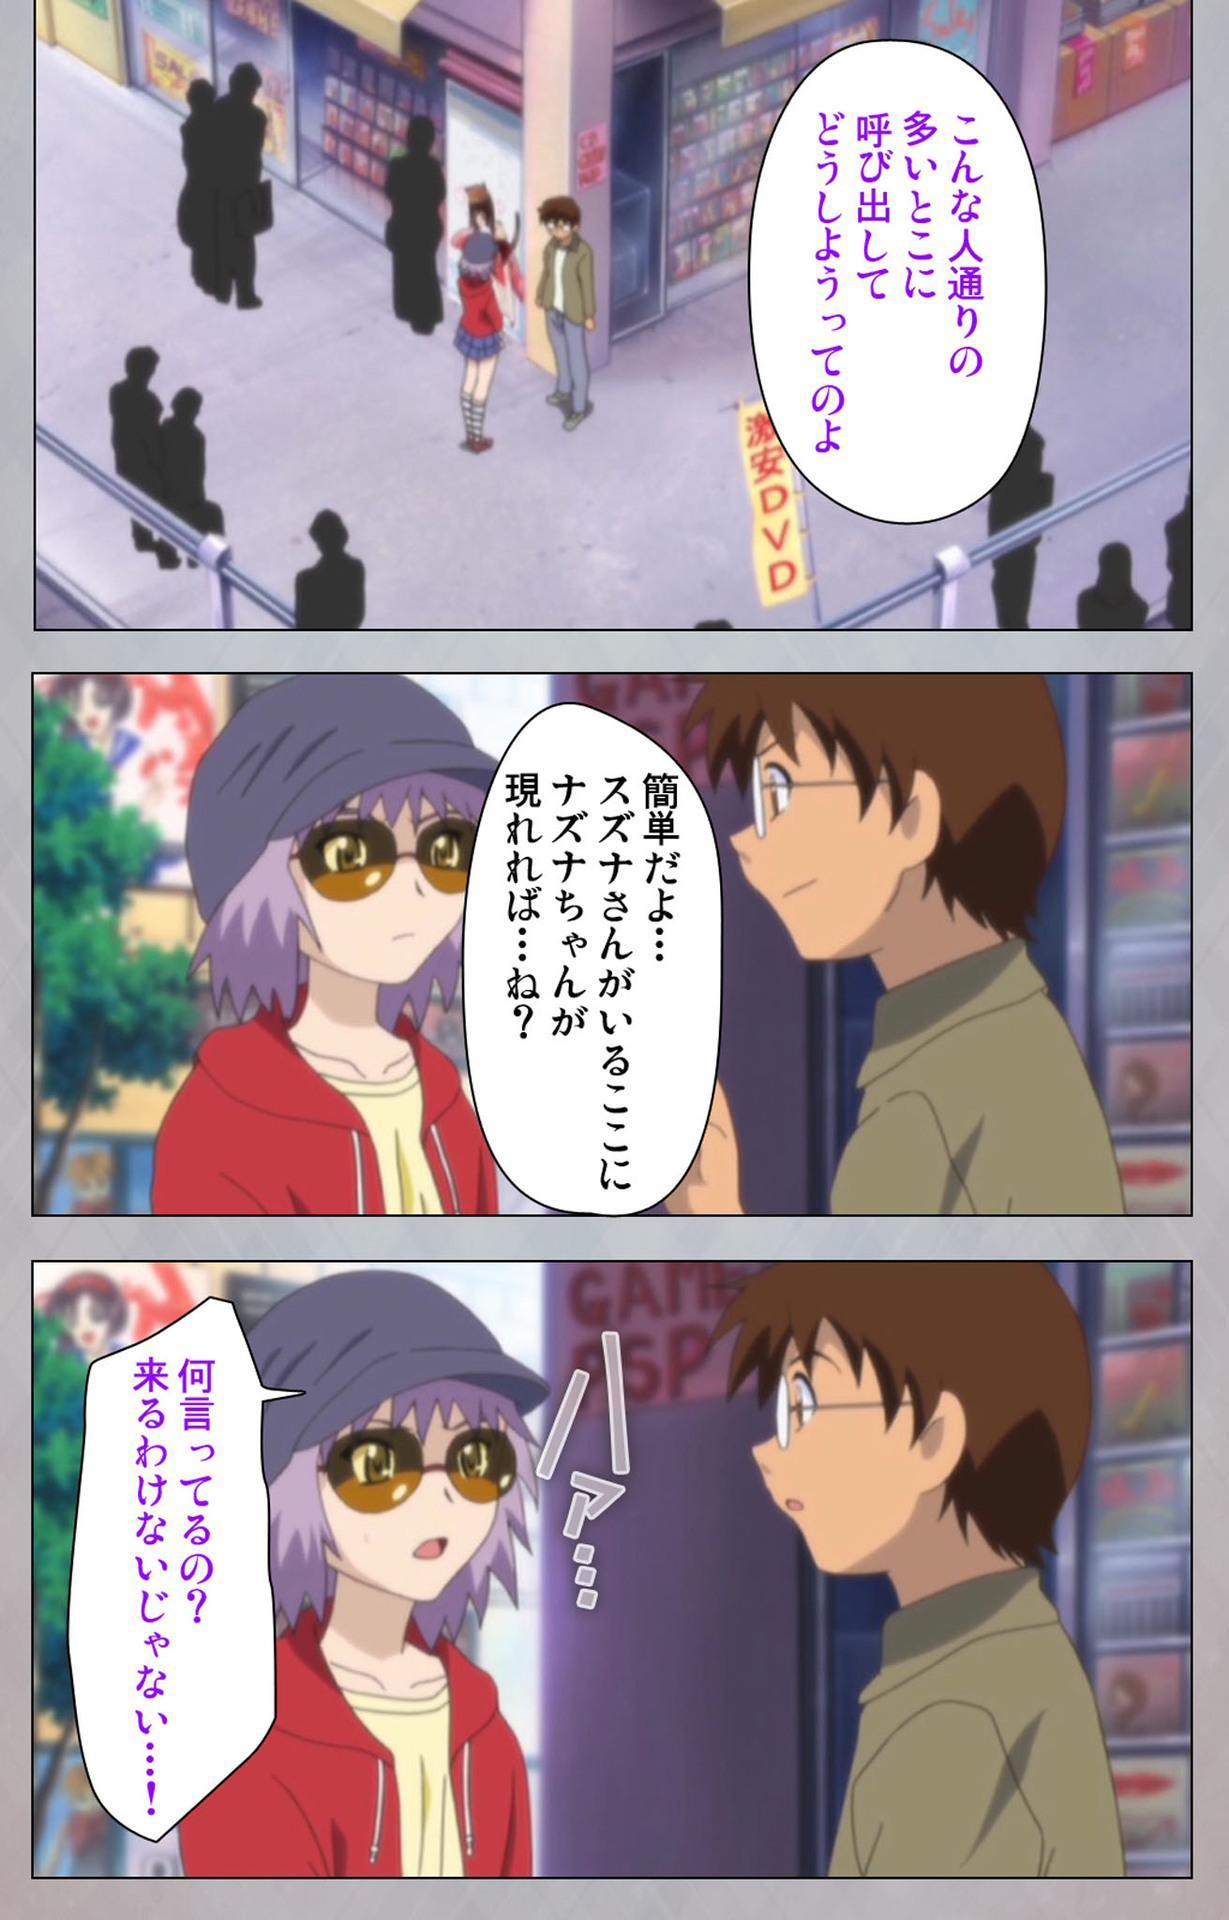 [Digital Works] [Full Color Seijin Ban] Sex Android ~Risou no Onna de Nuite yaru~ Kanzenban 178